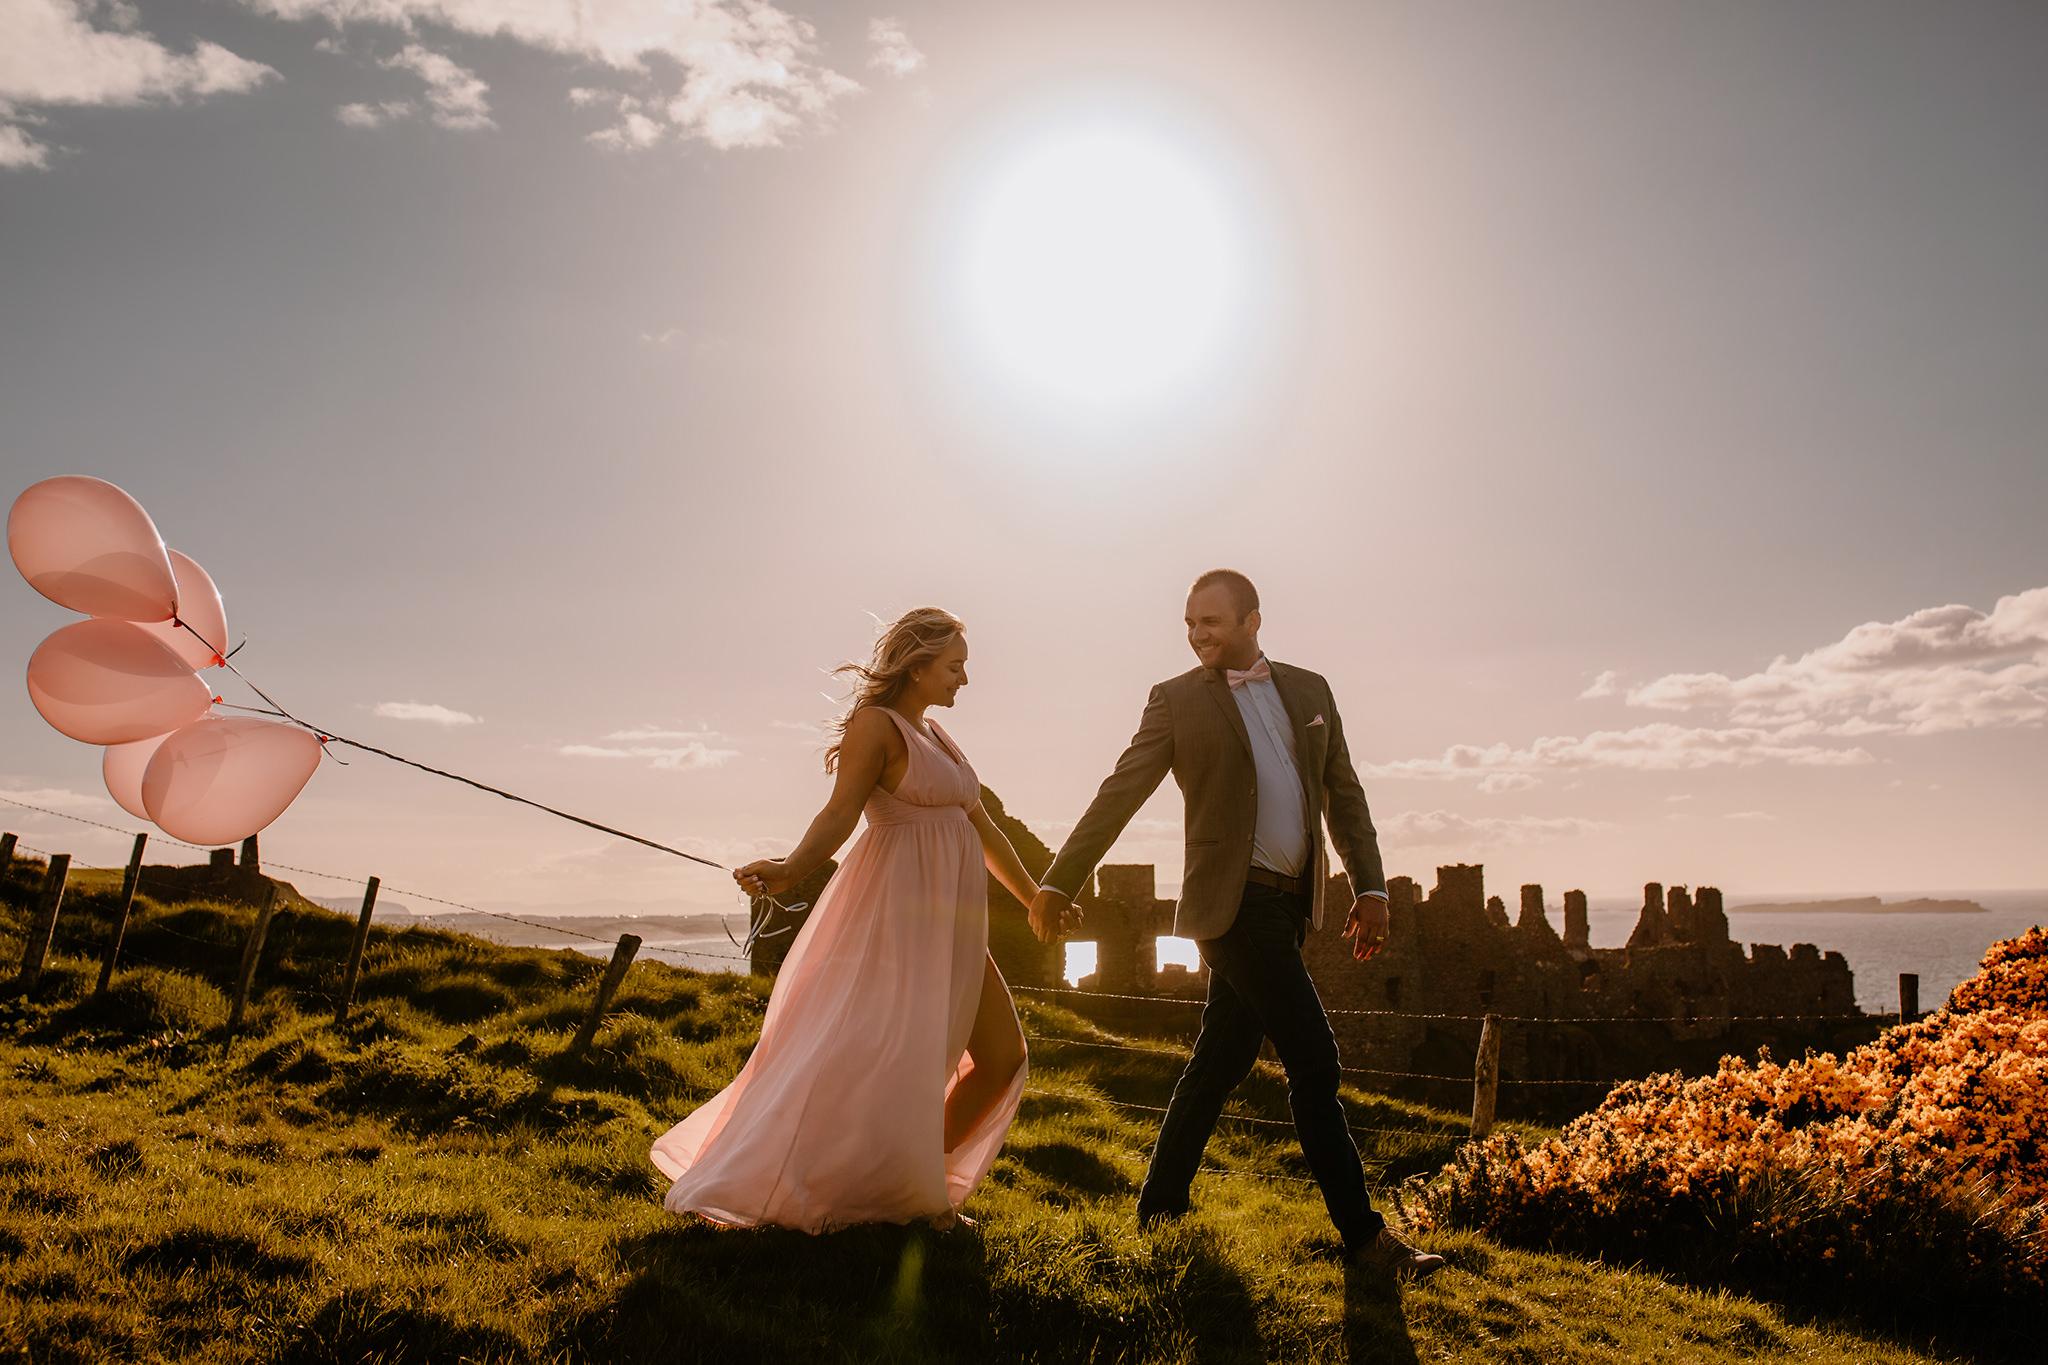 dunluce+castle+maternity+photographer+northern+ireland (6).jpg